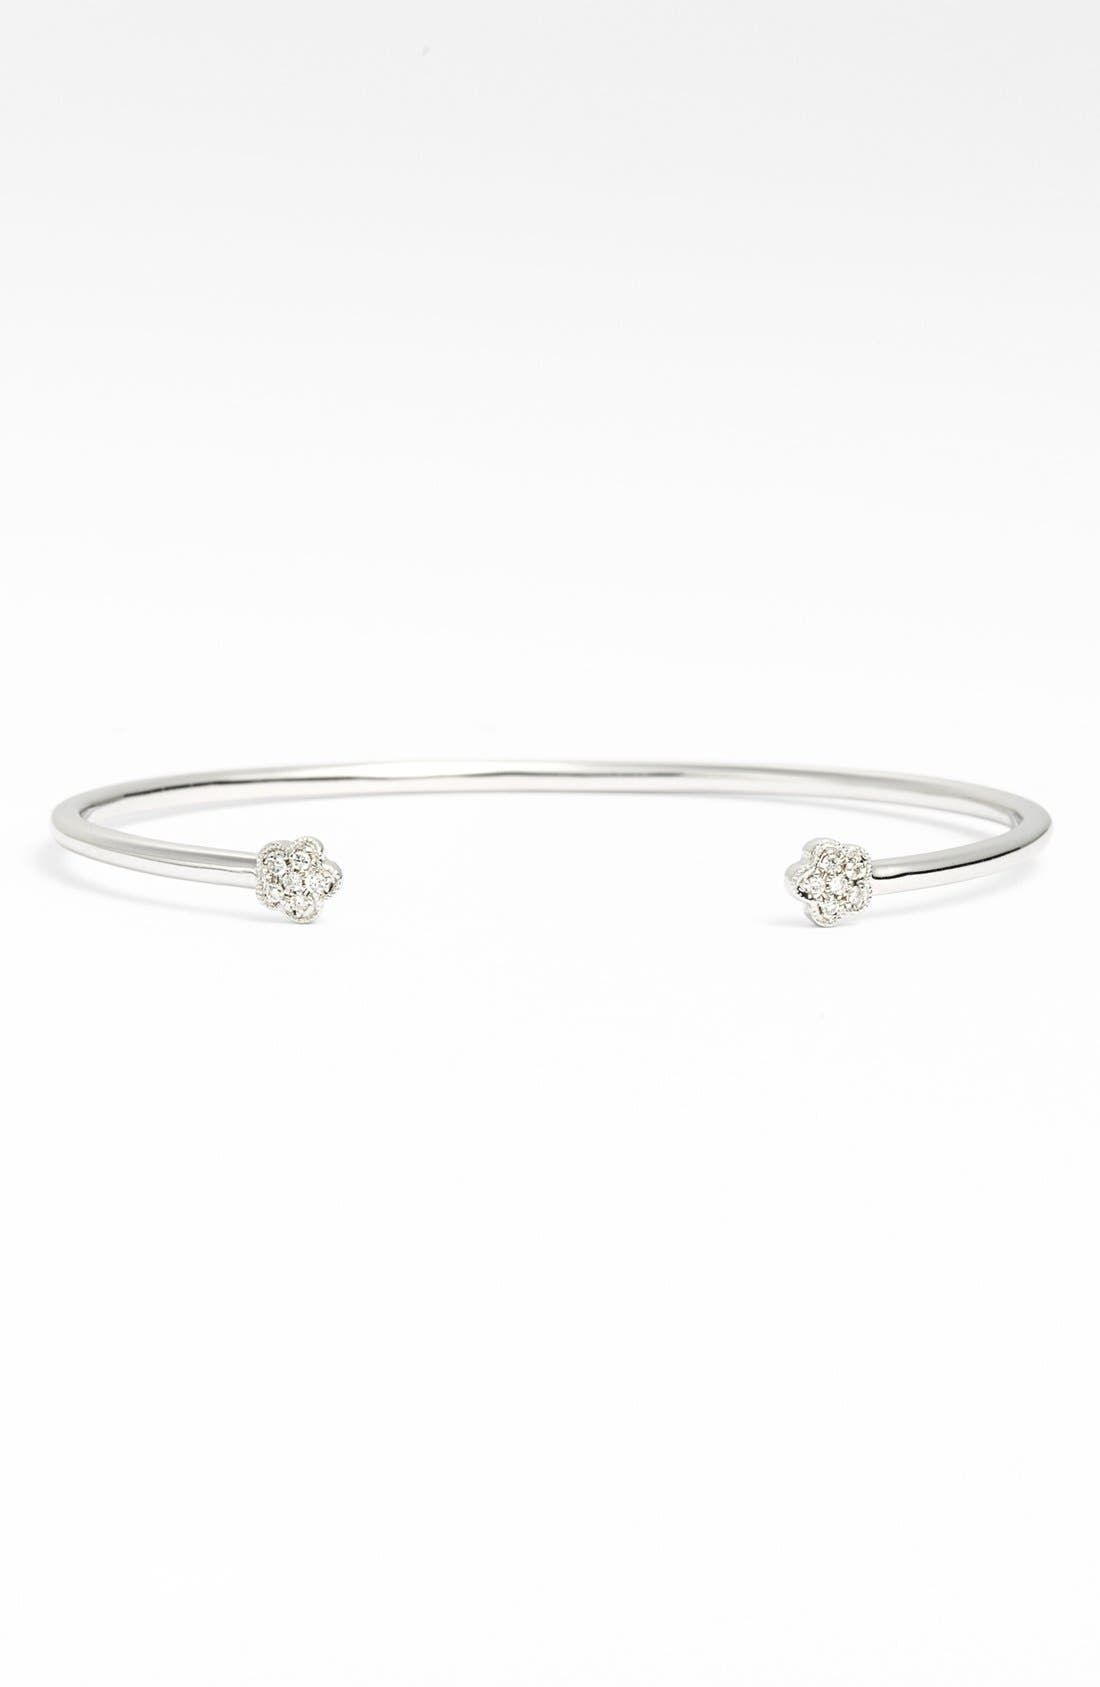 Alternate Image 1 Selected - Dana Rebecca Designs 'Sylvie Rose' Diamond Cuff